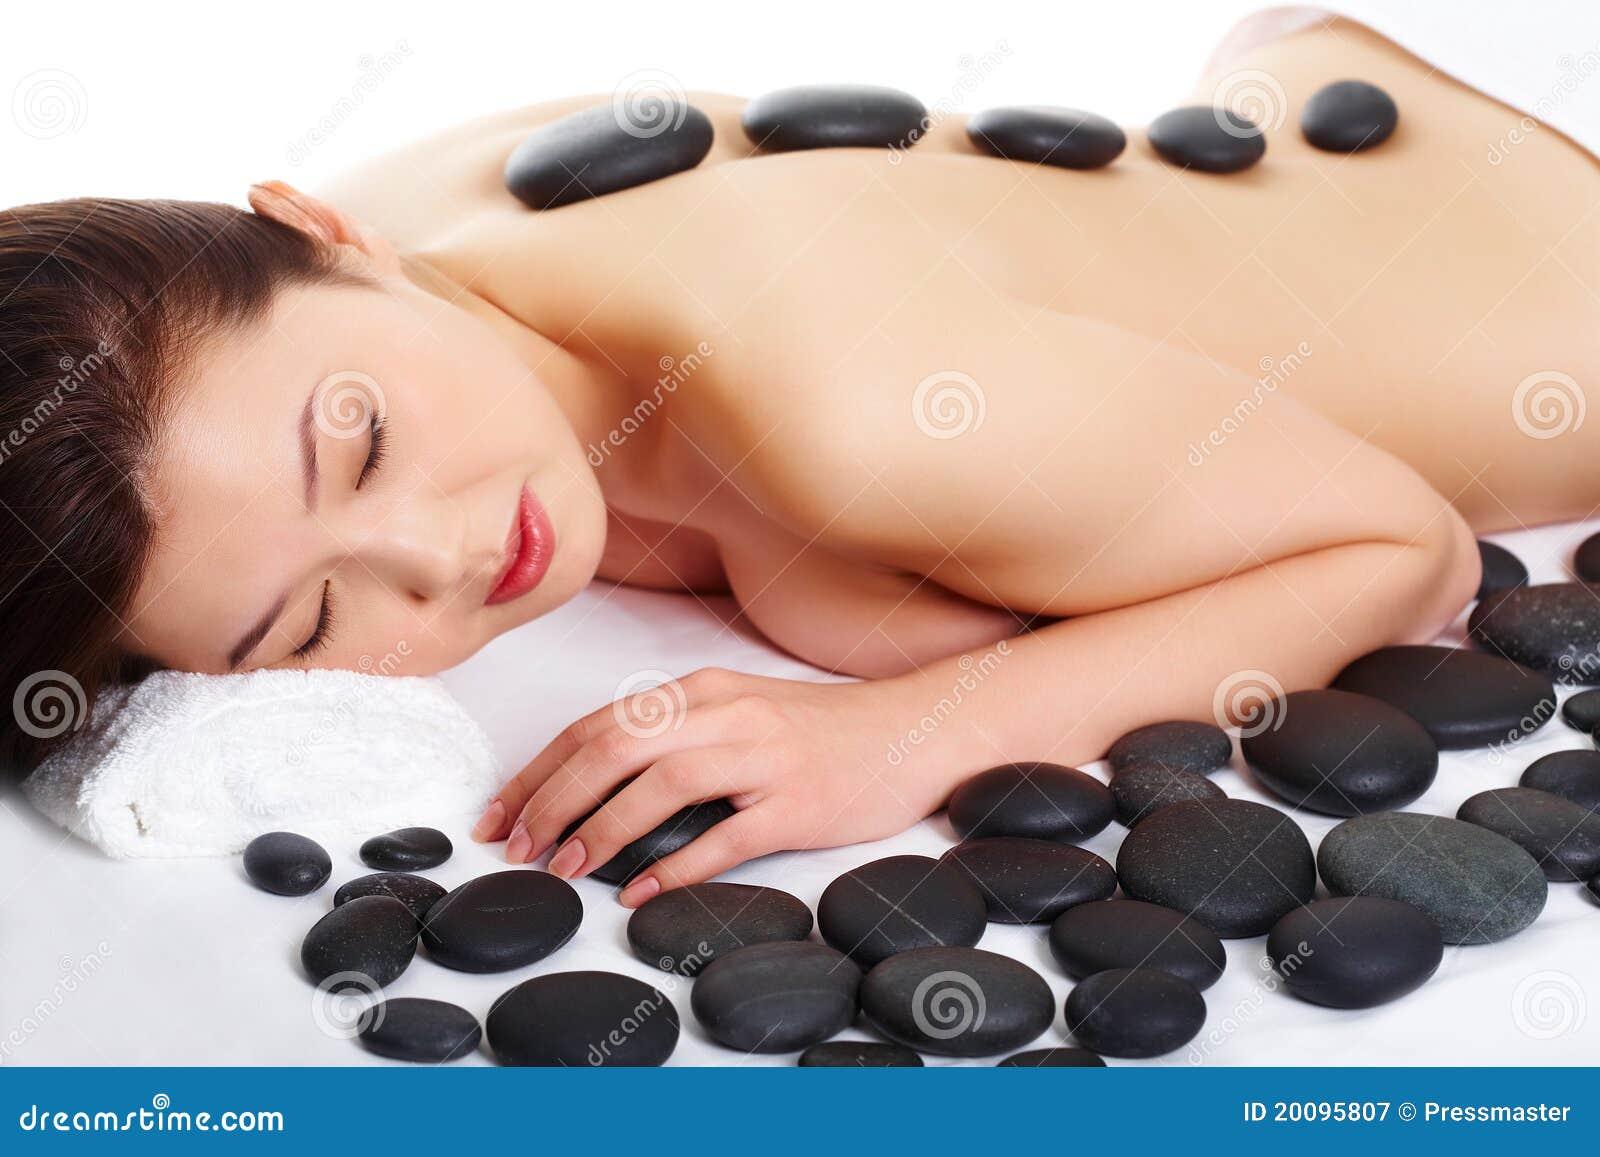 Before massage